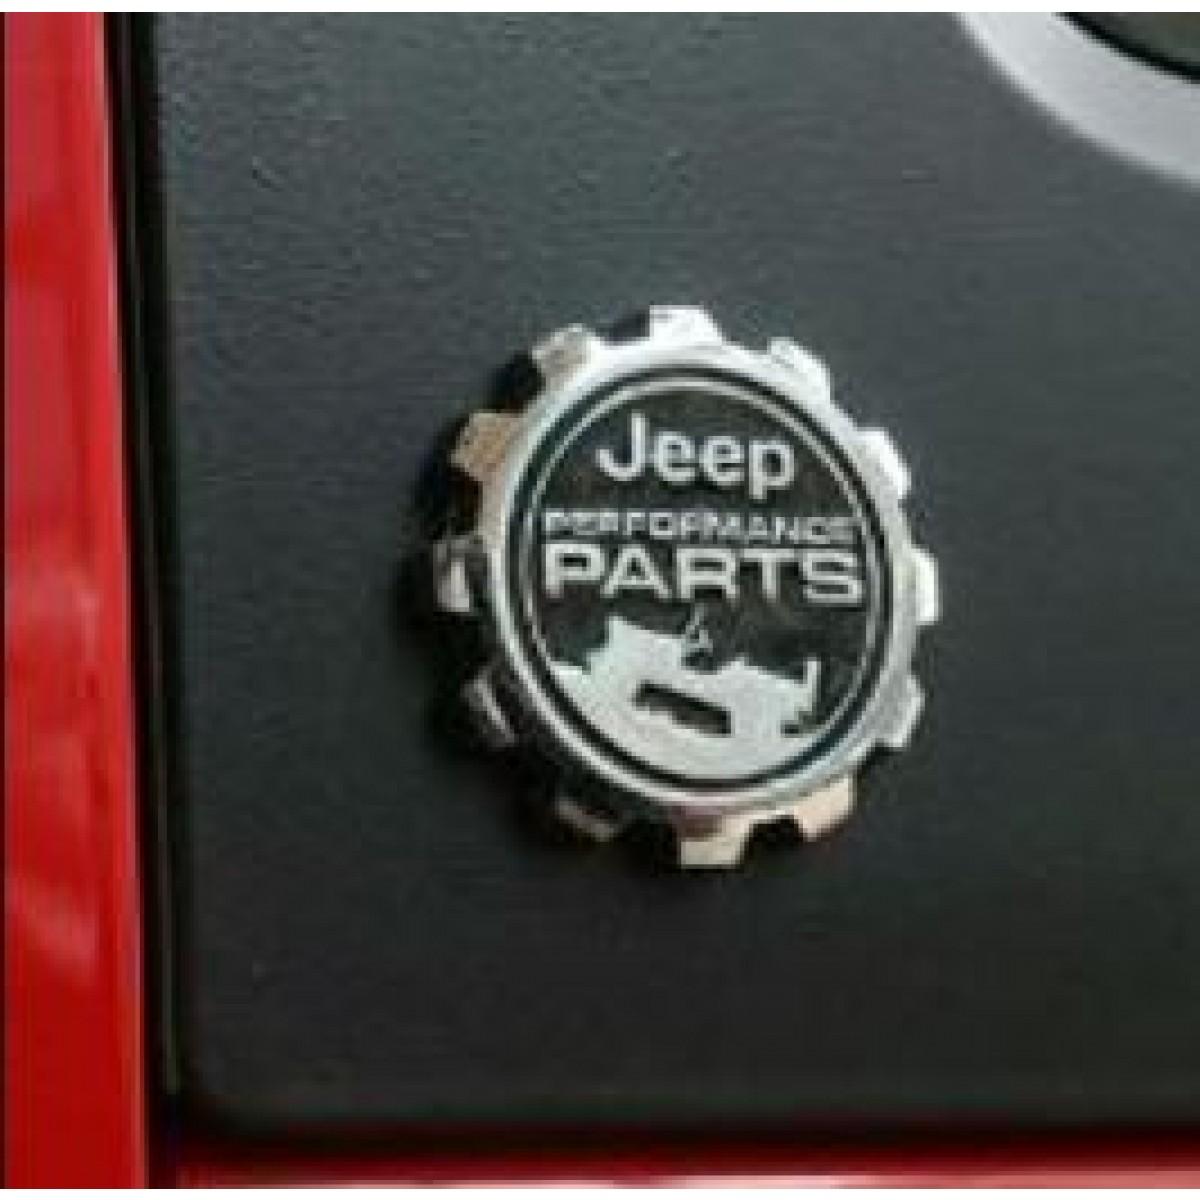 Jeep Performance Parts >> Jeep Performance Parts Emblems